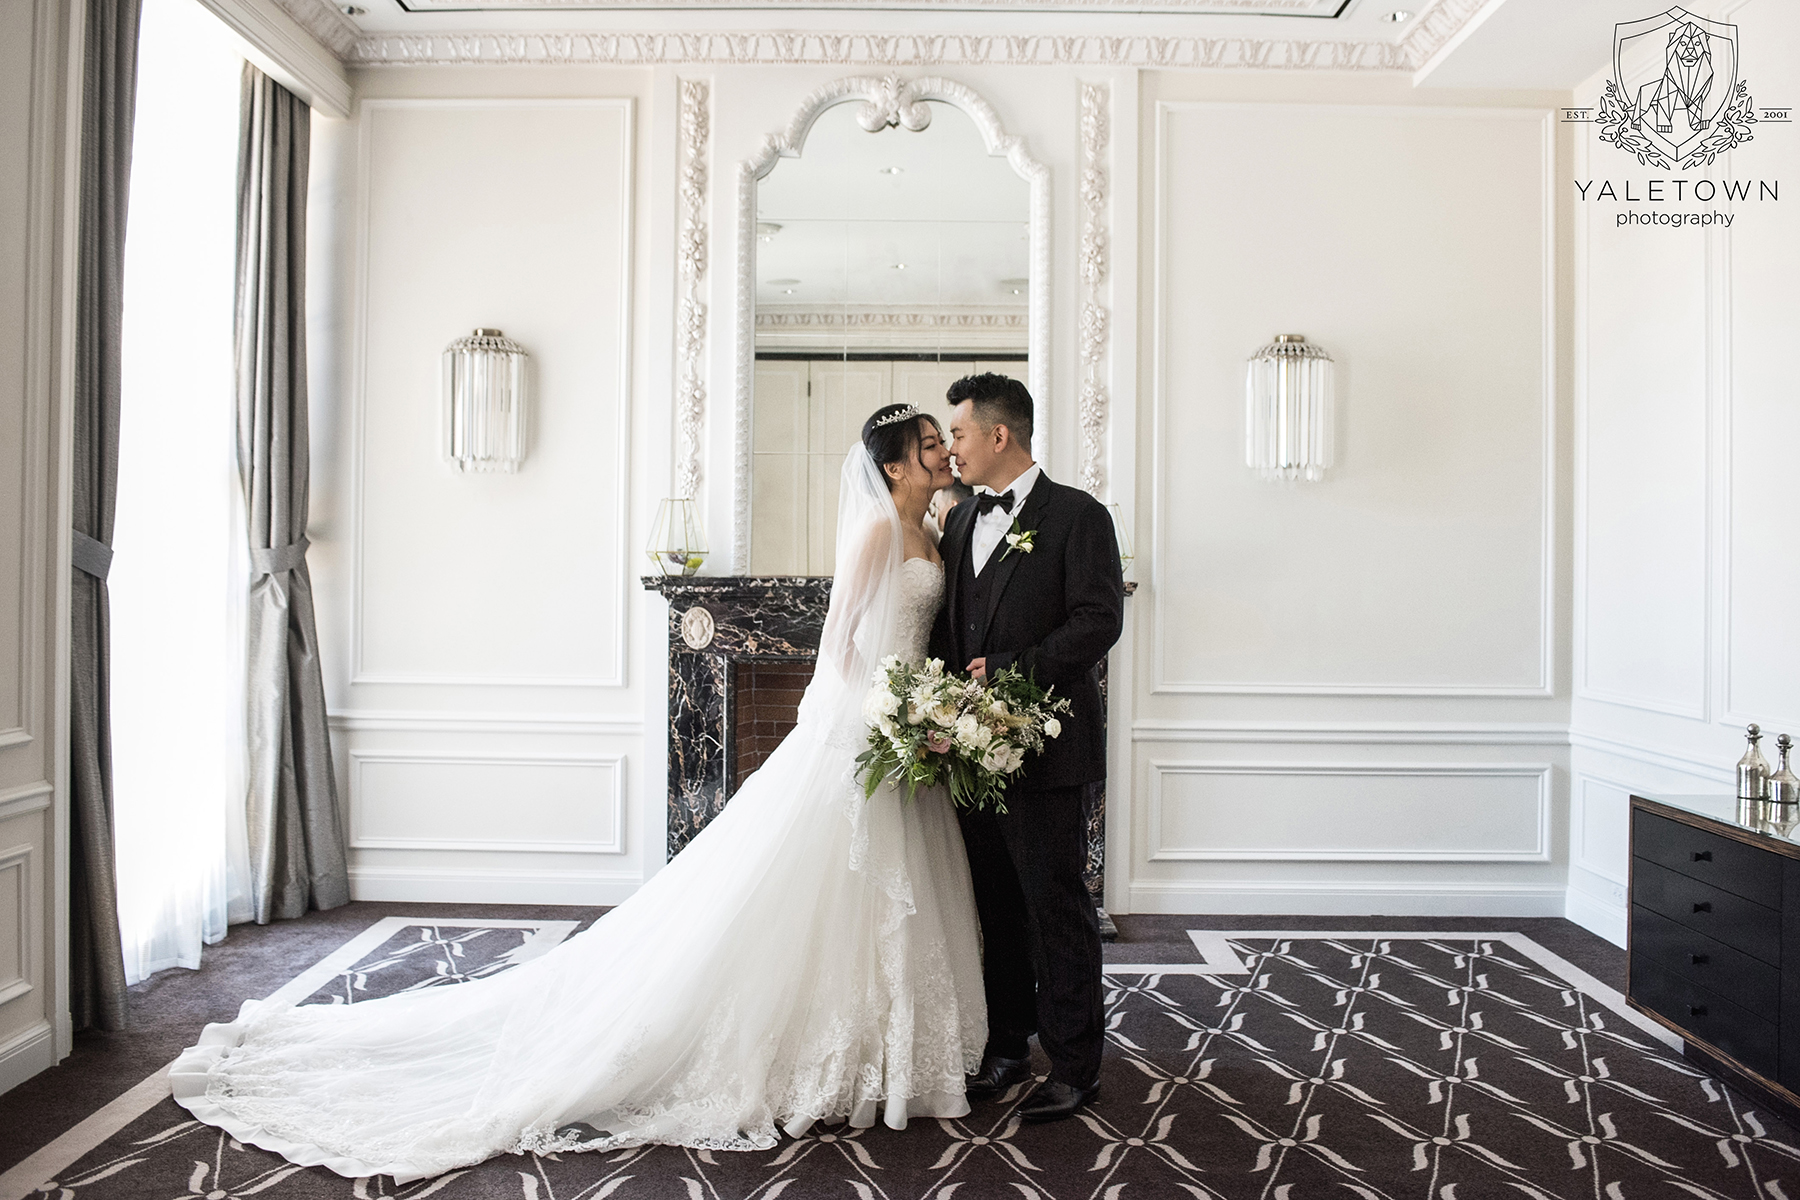 Bride-Groom-PortraitsRosewood-Hotel-Georgia-Vancouver-Wedding-Yaletown-Photography-photo